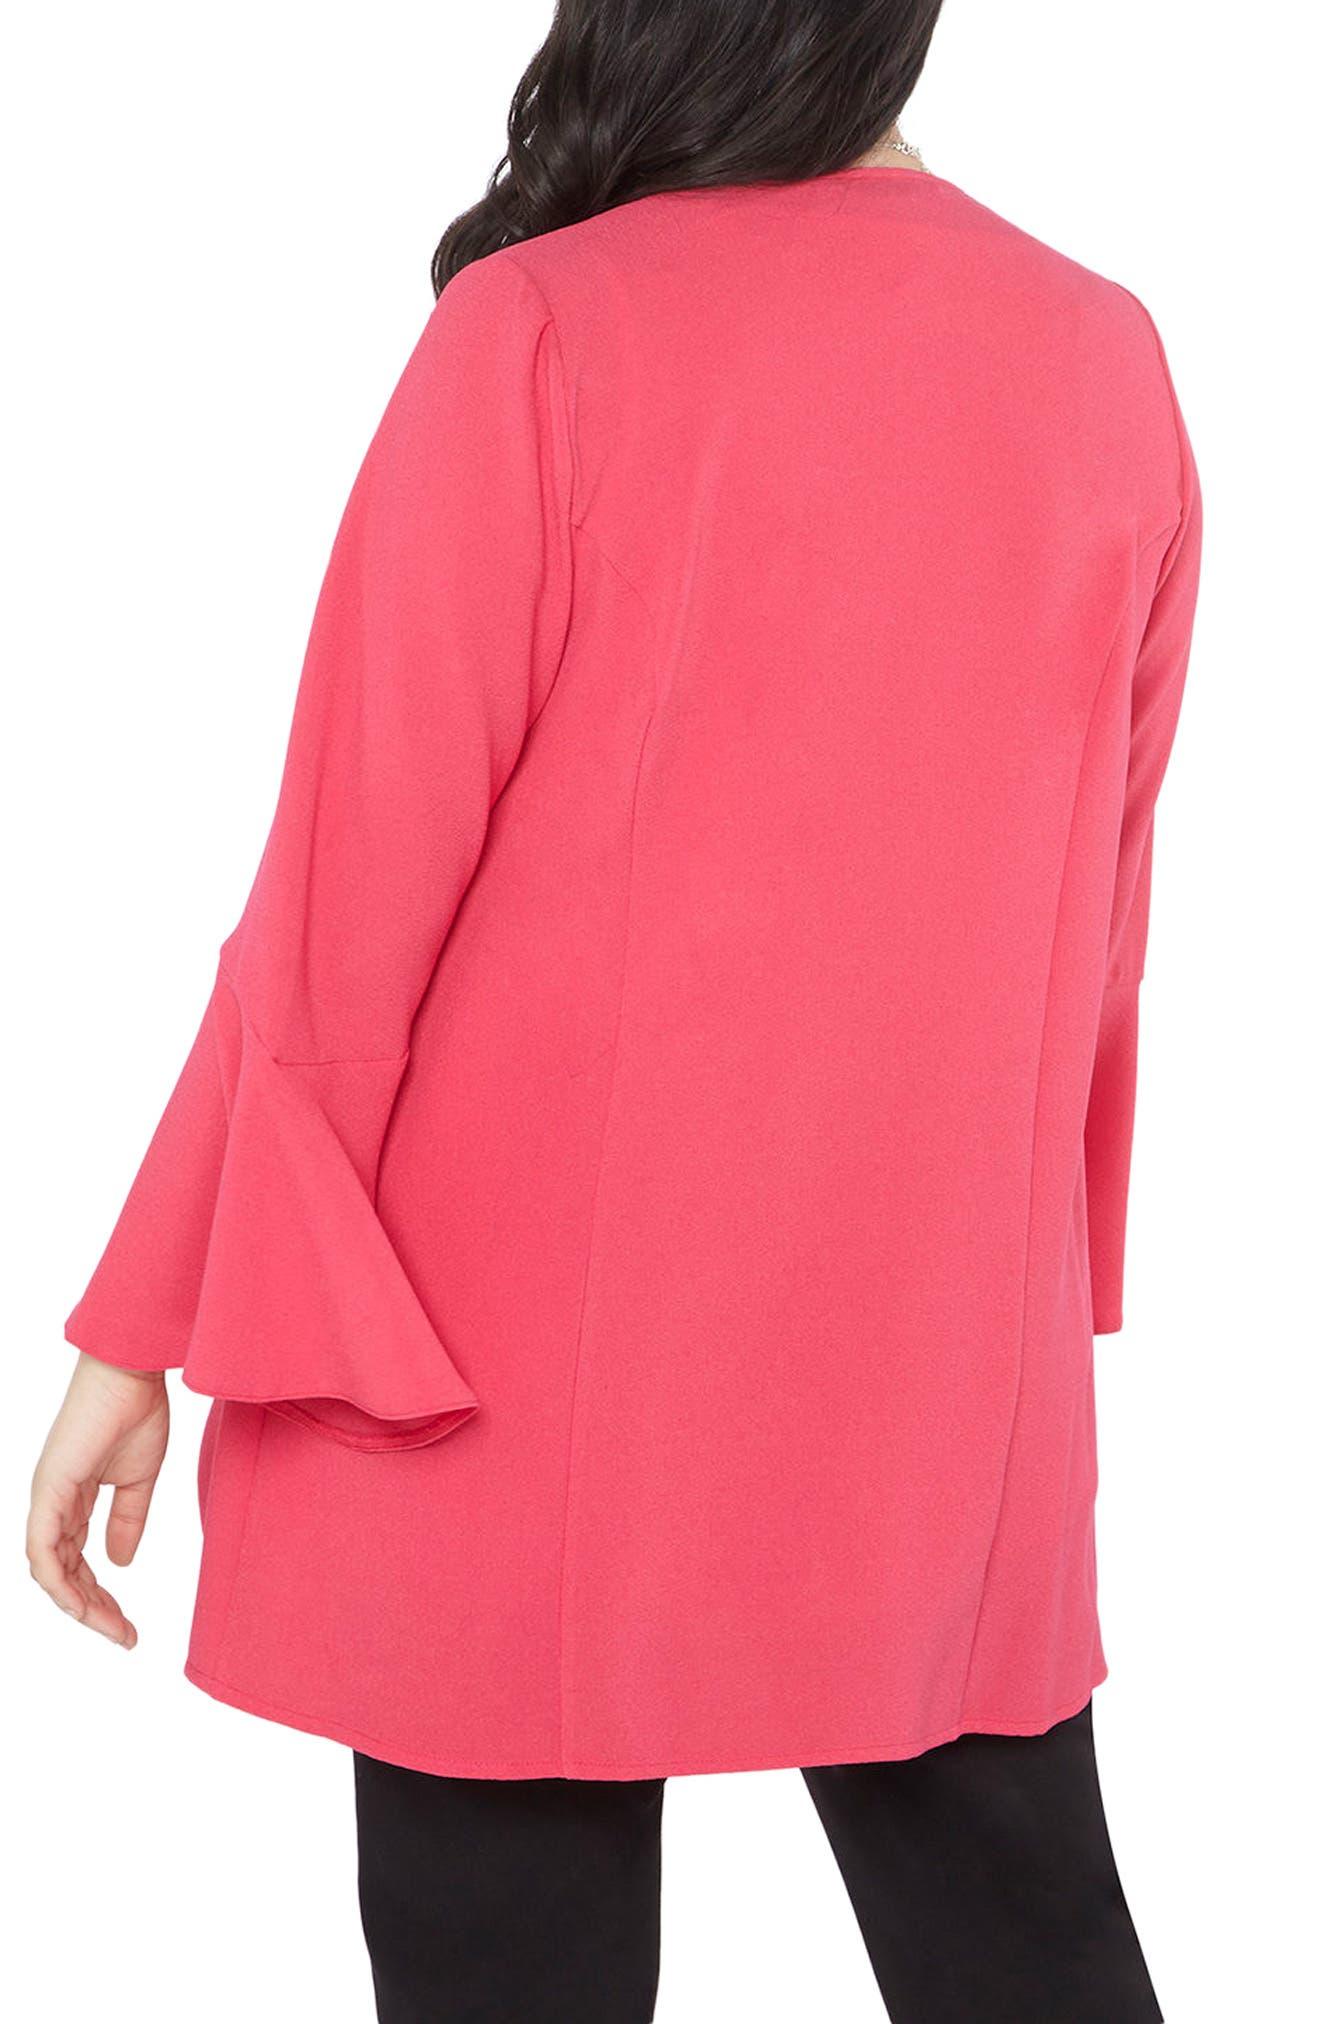 Ruffle Sleeve Jacket,                             Alternate thumbnail 2, color,                             Hot Pink